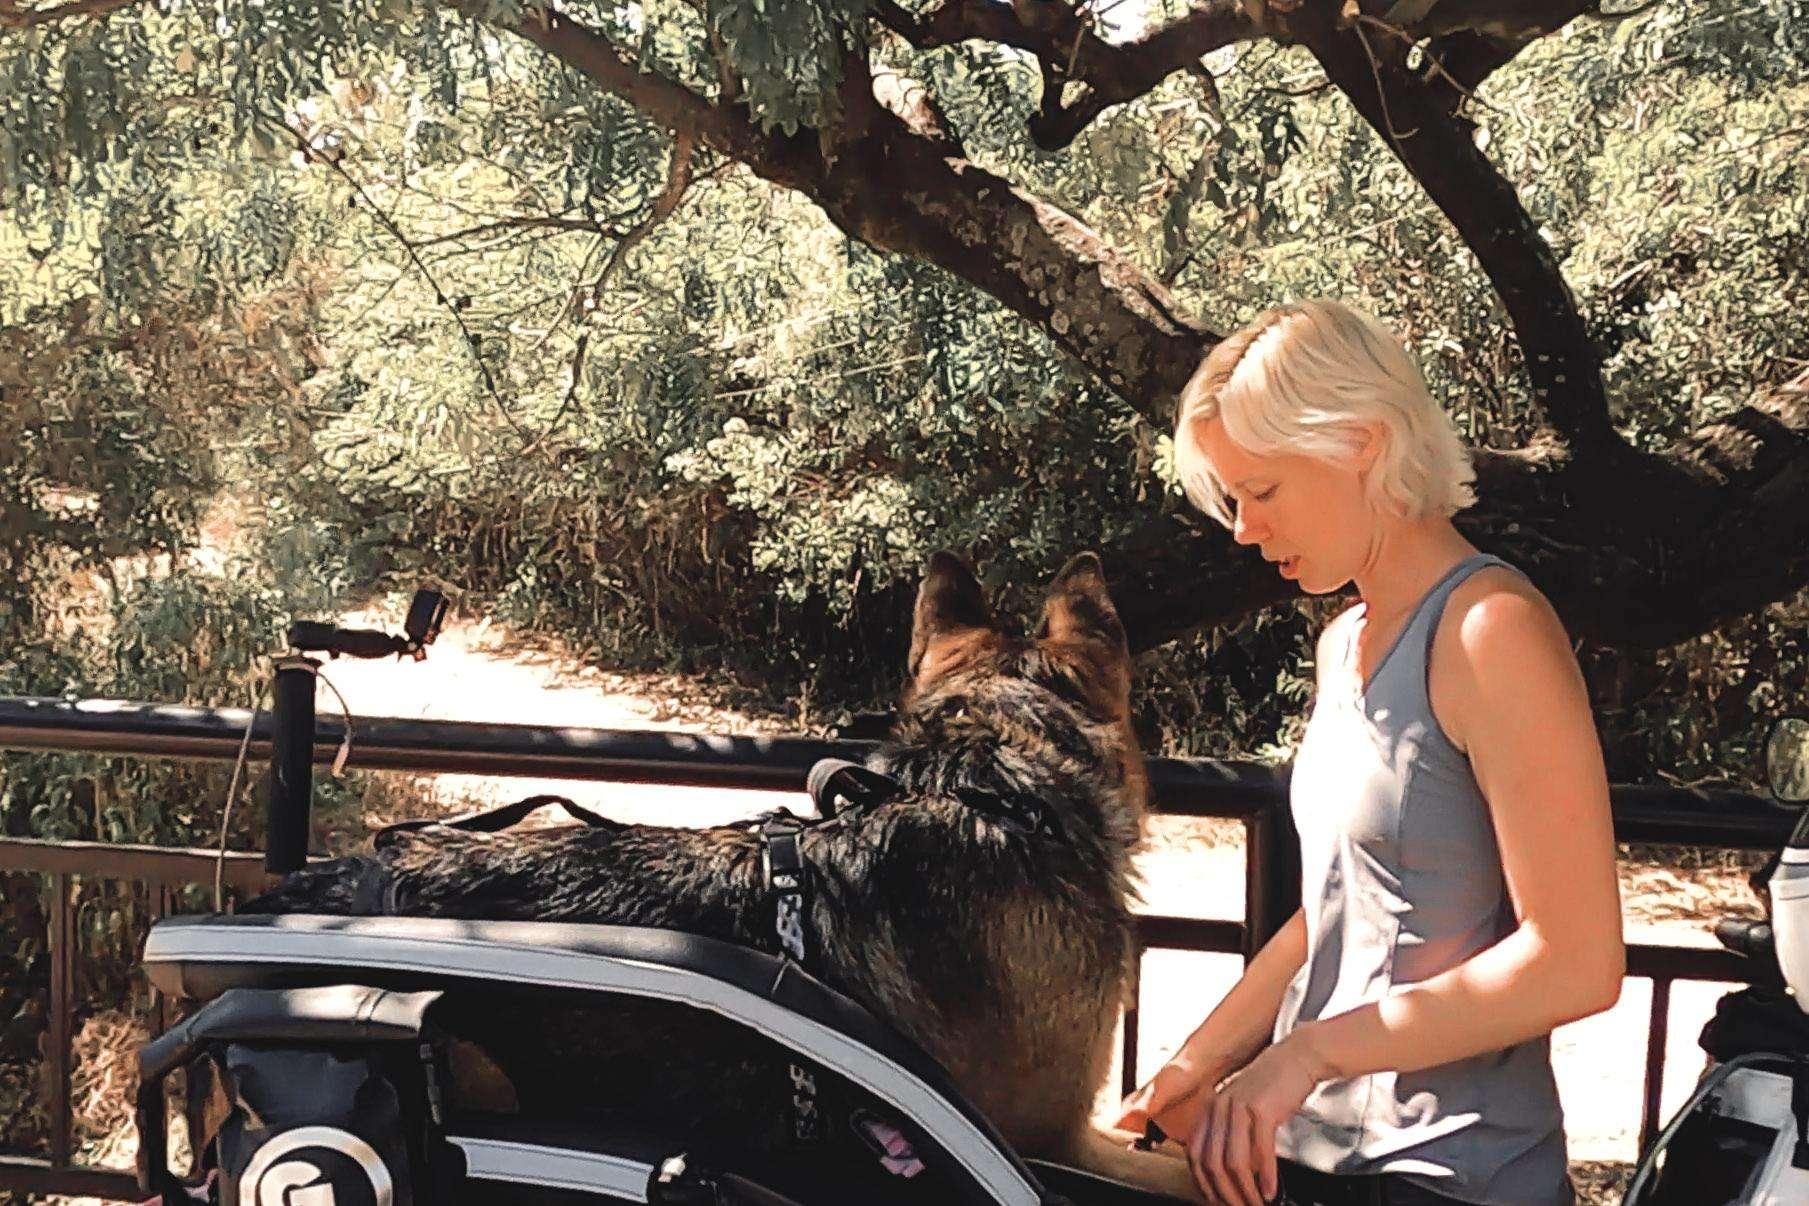 Blonde woman secures German Shepherd into motorcycle dog carrier harness